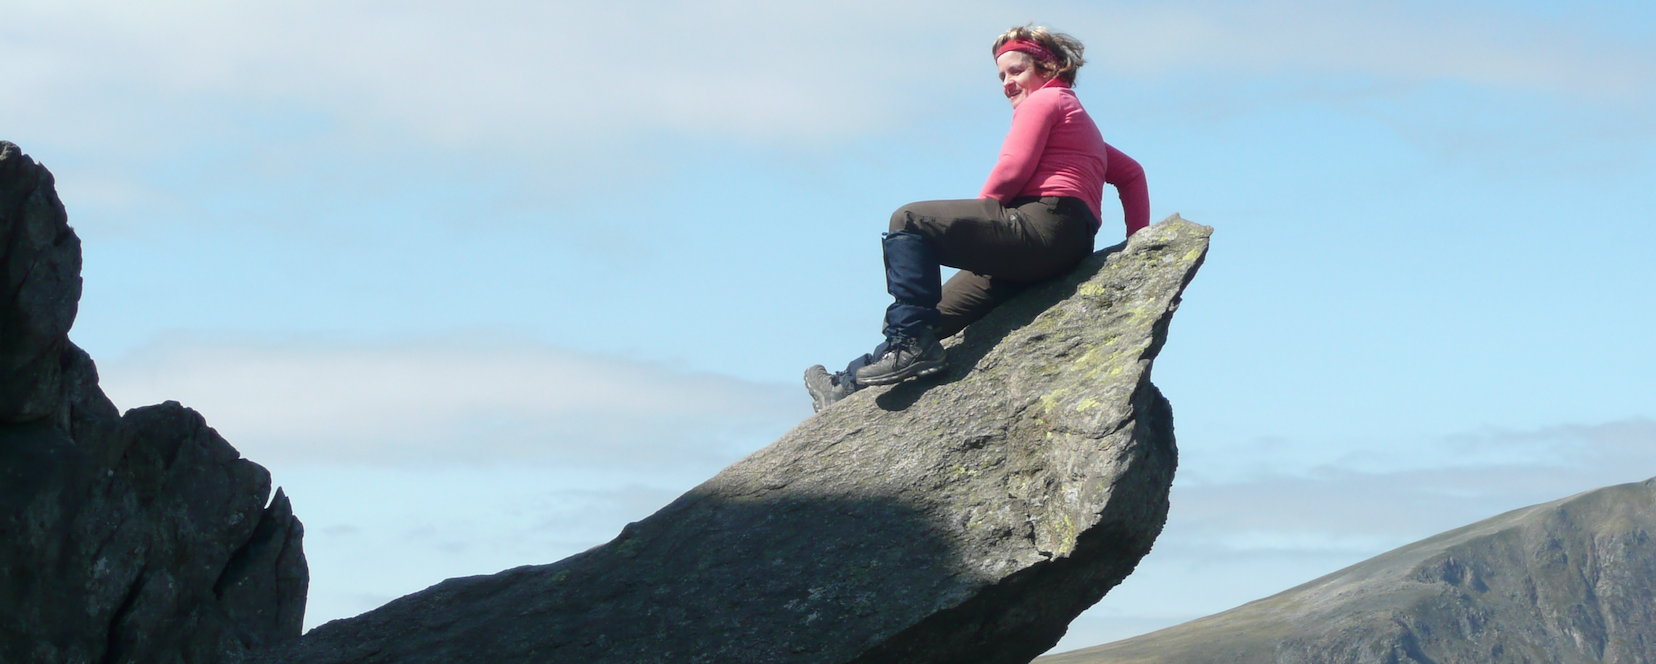 Sile Snowdonia 2011